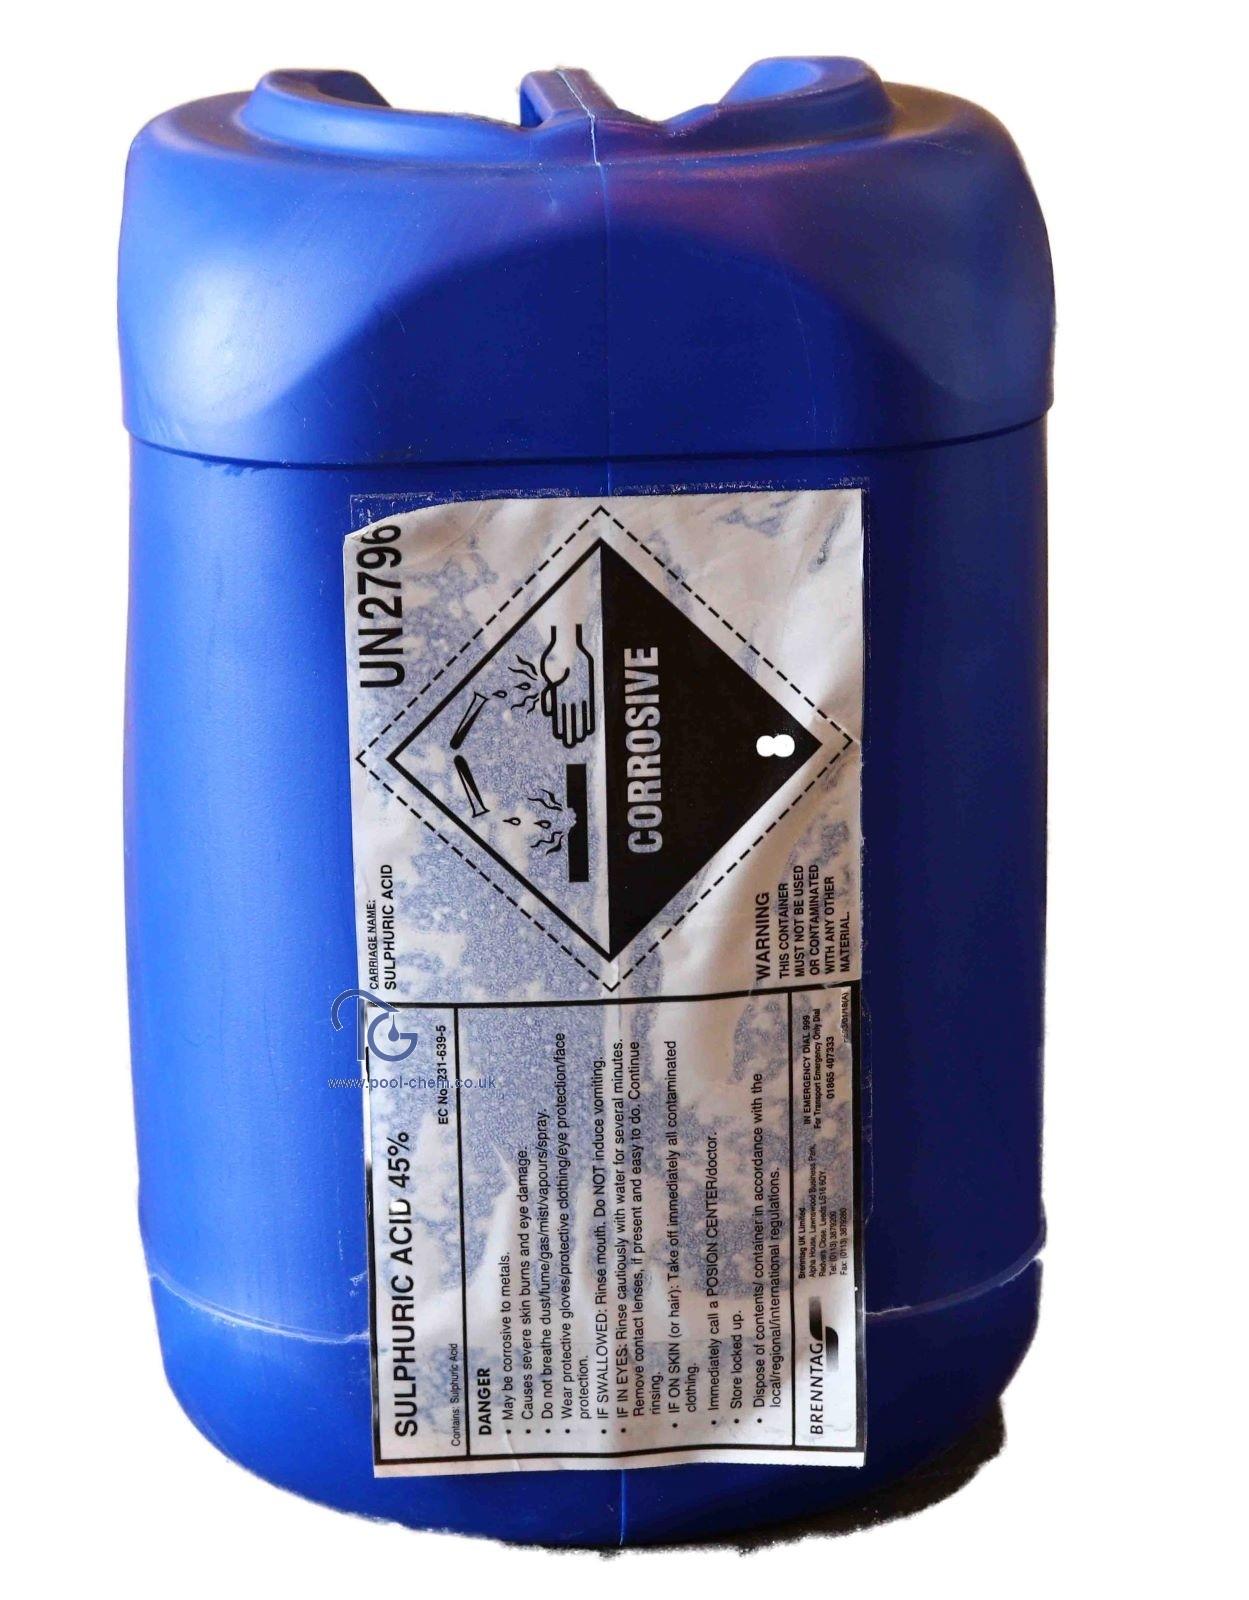 Sulphuric Acid 45% (28Kgs Polican) - Swimming Pool Chemicals